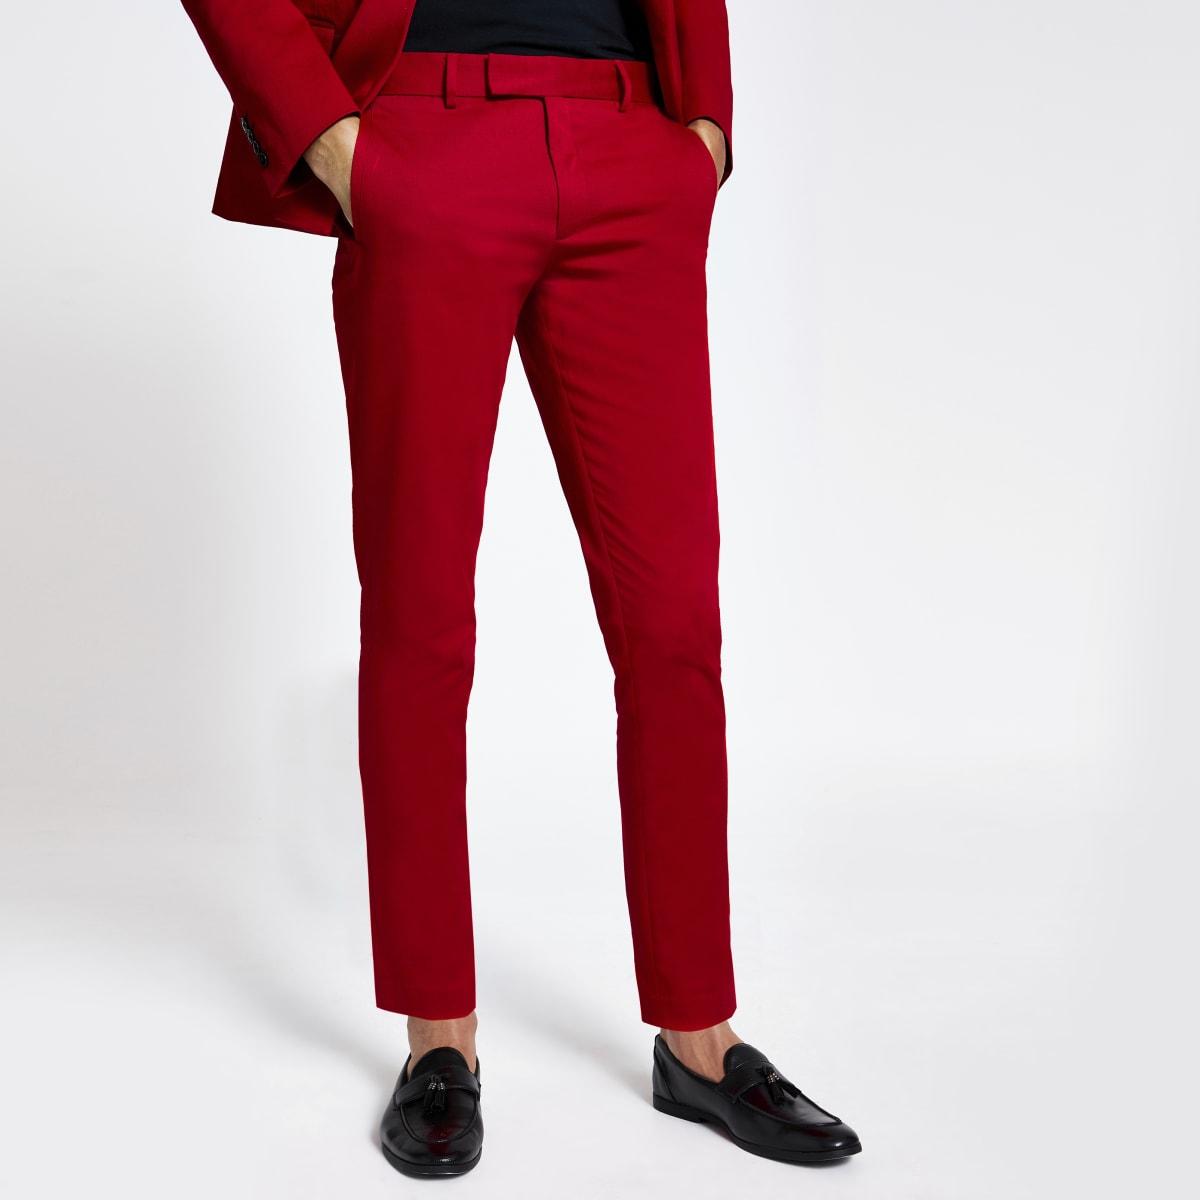 Rode skinny pantalon met stretch